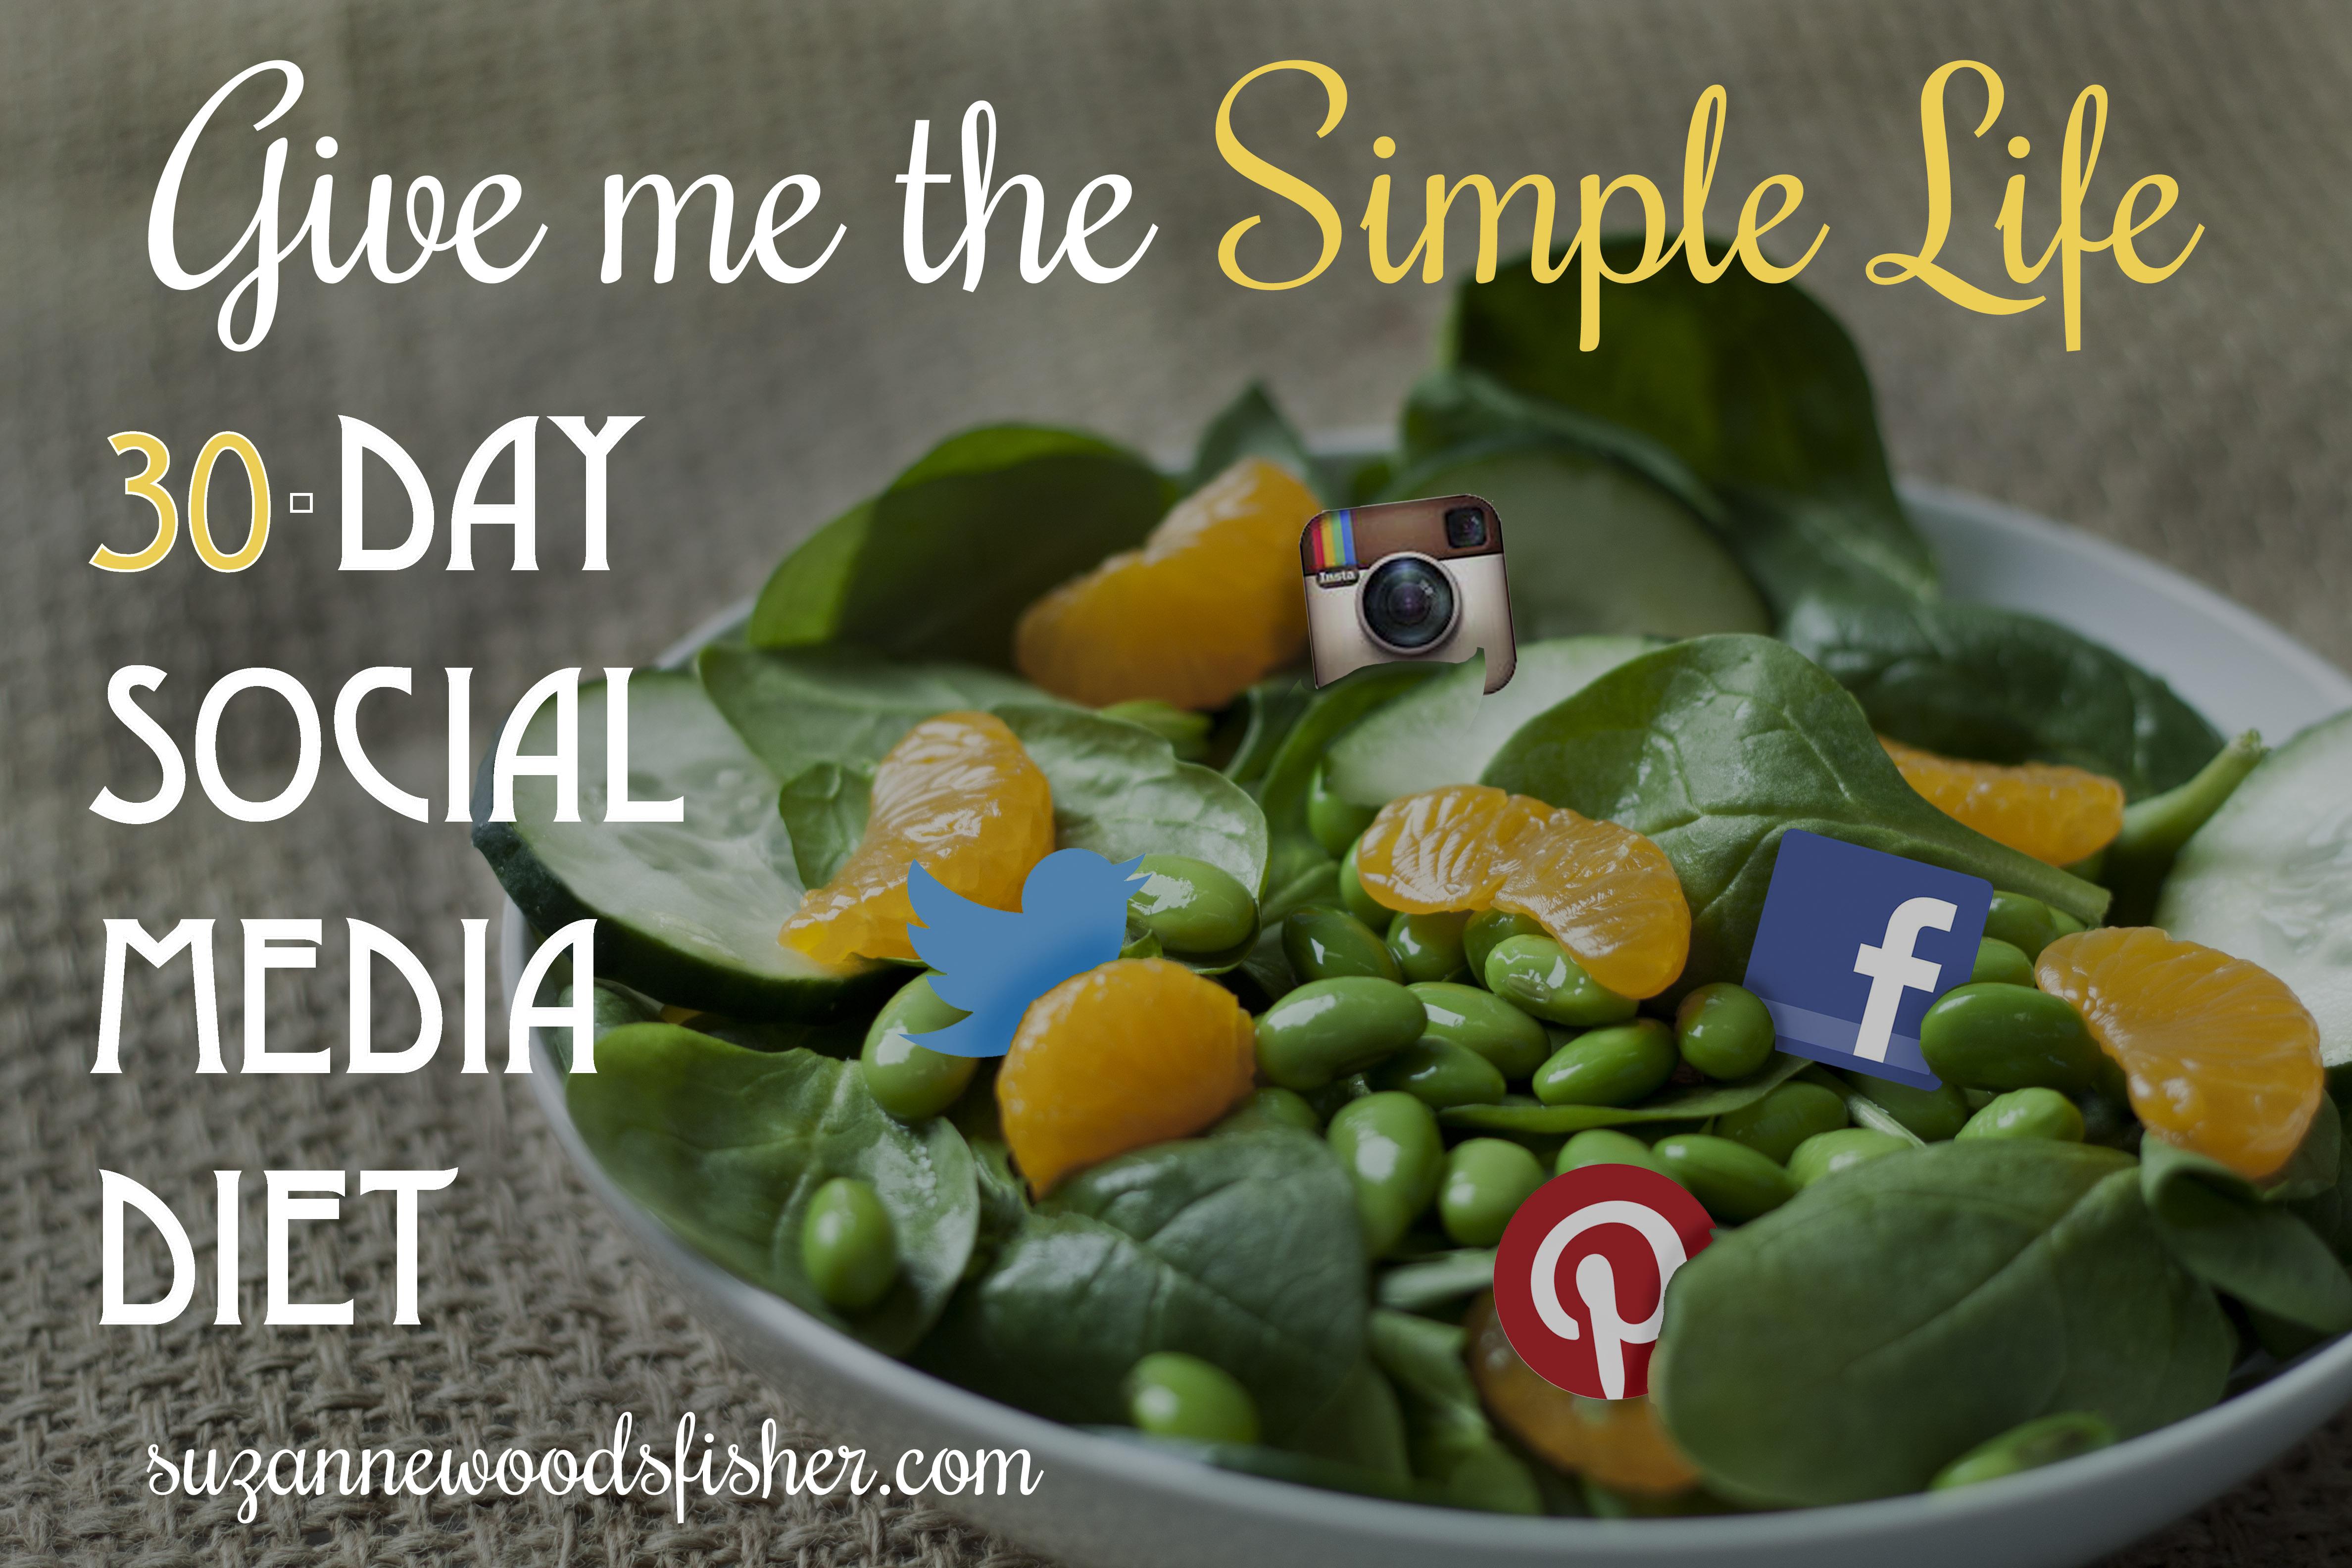 swf-socialmediadiet